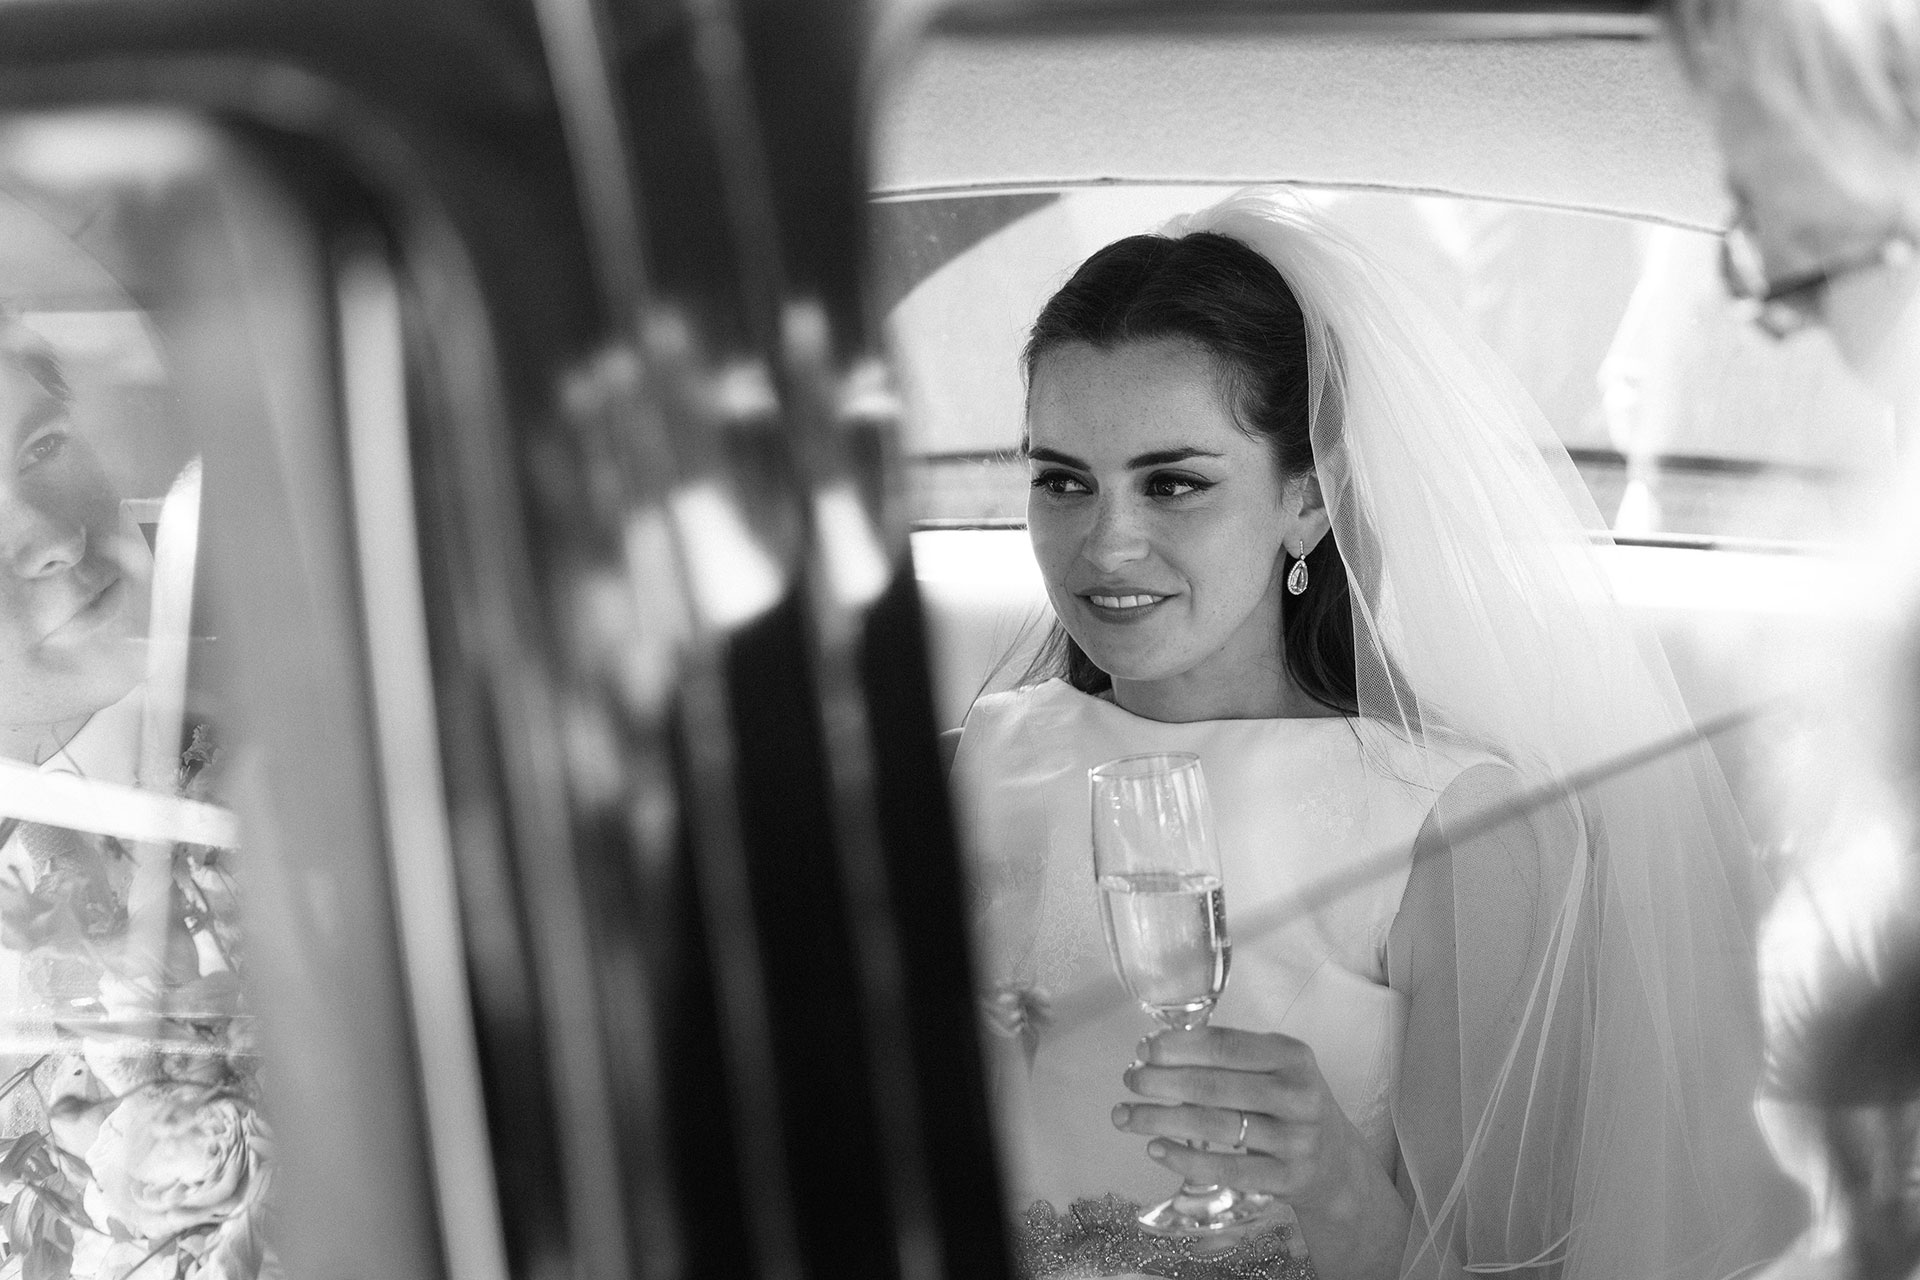 Langar-Hall-wedding-photographer-in-Nottinghamshire-Michael-Newington-Gray-47.jpg